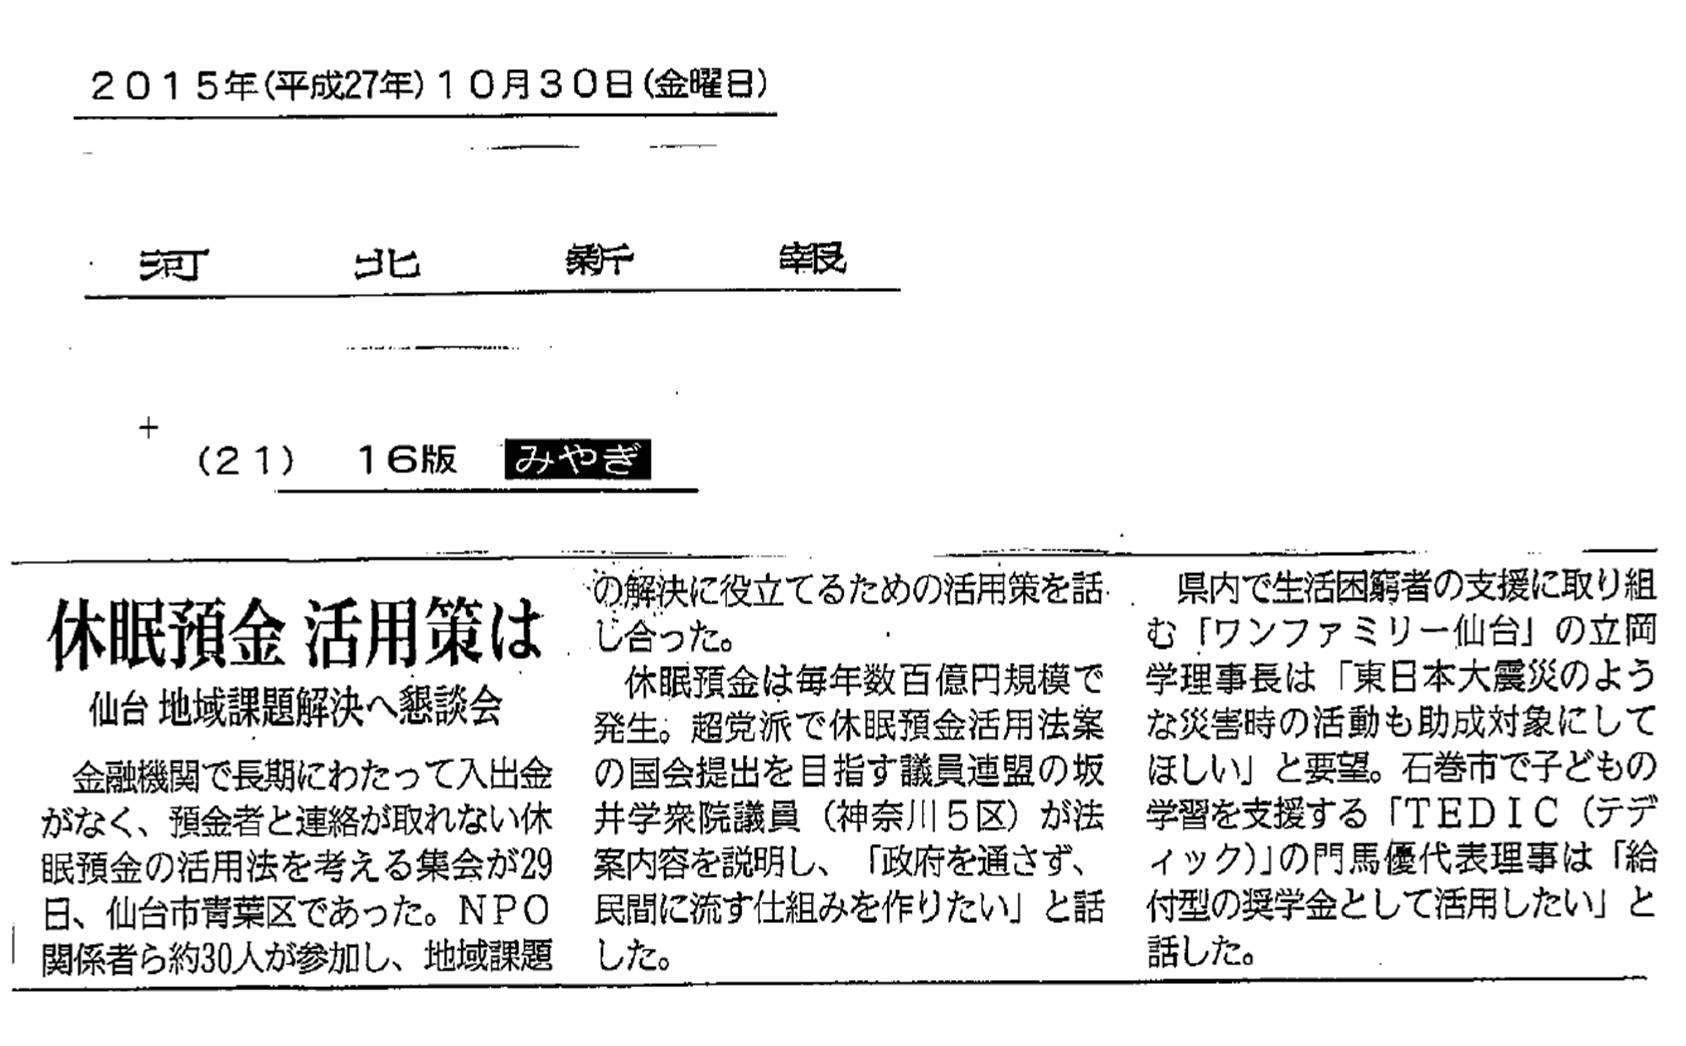 http://kyumin.jp/media/20151030%E6%B2%B3%E5%8C%97%E6%96%B0%E5%A0%B1.jpg